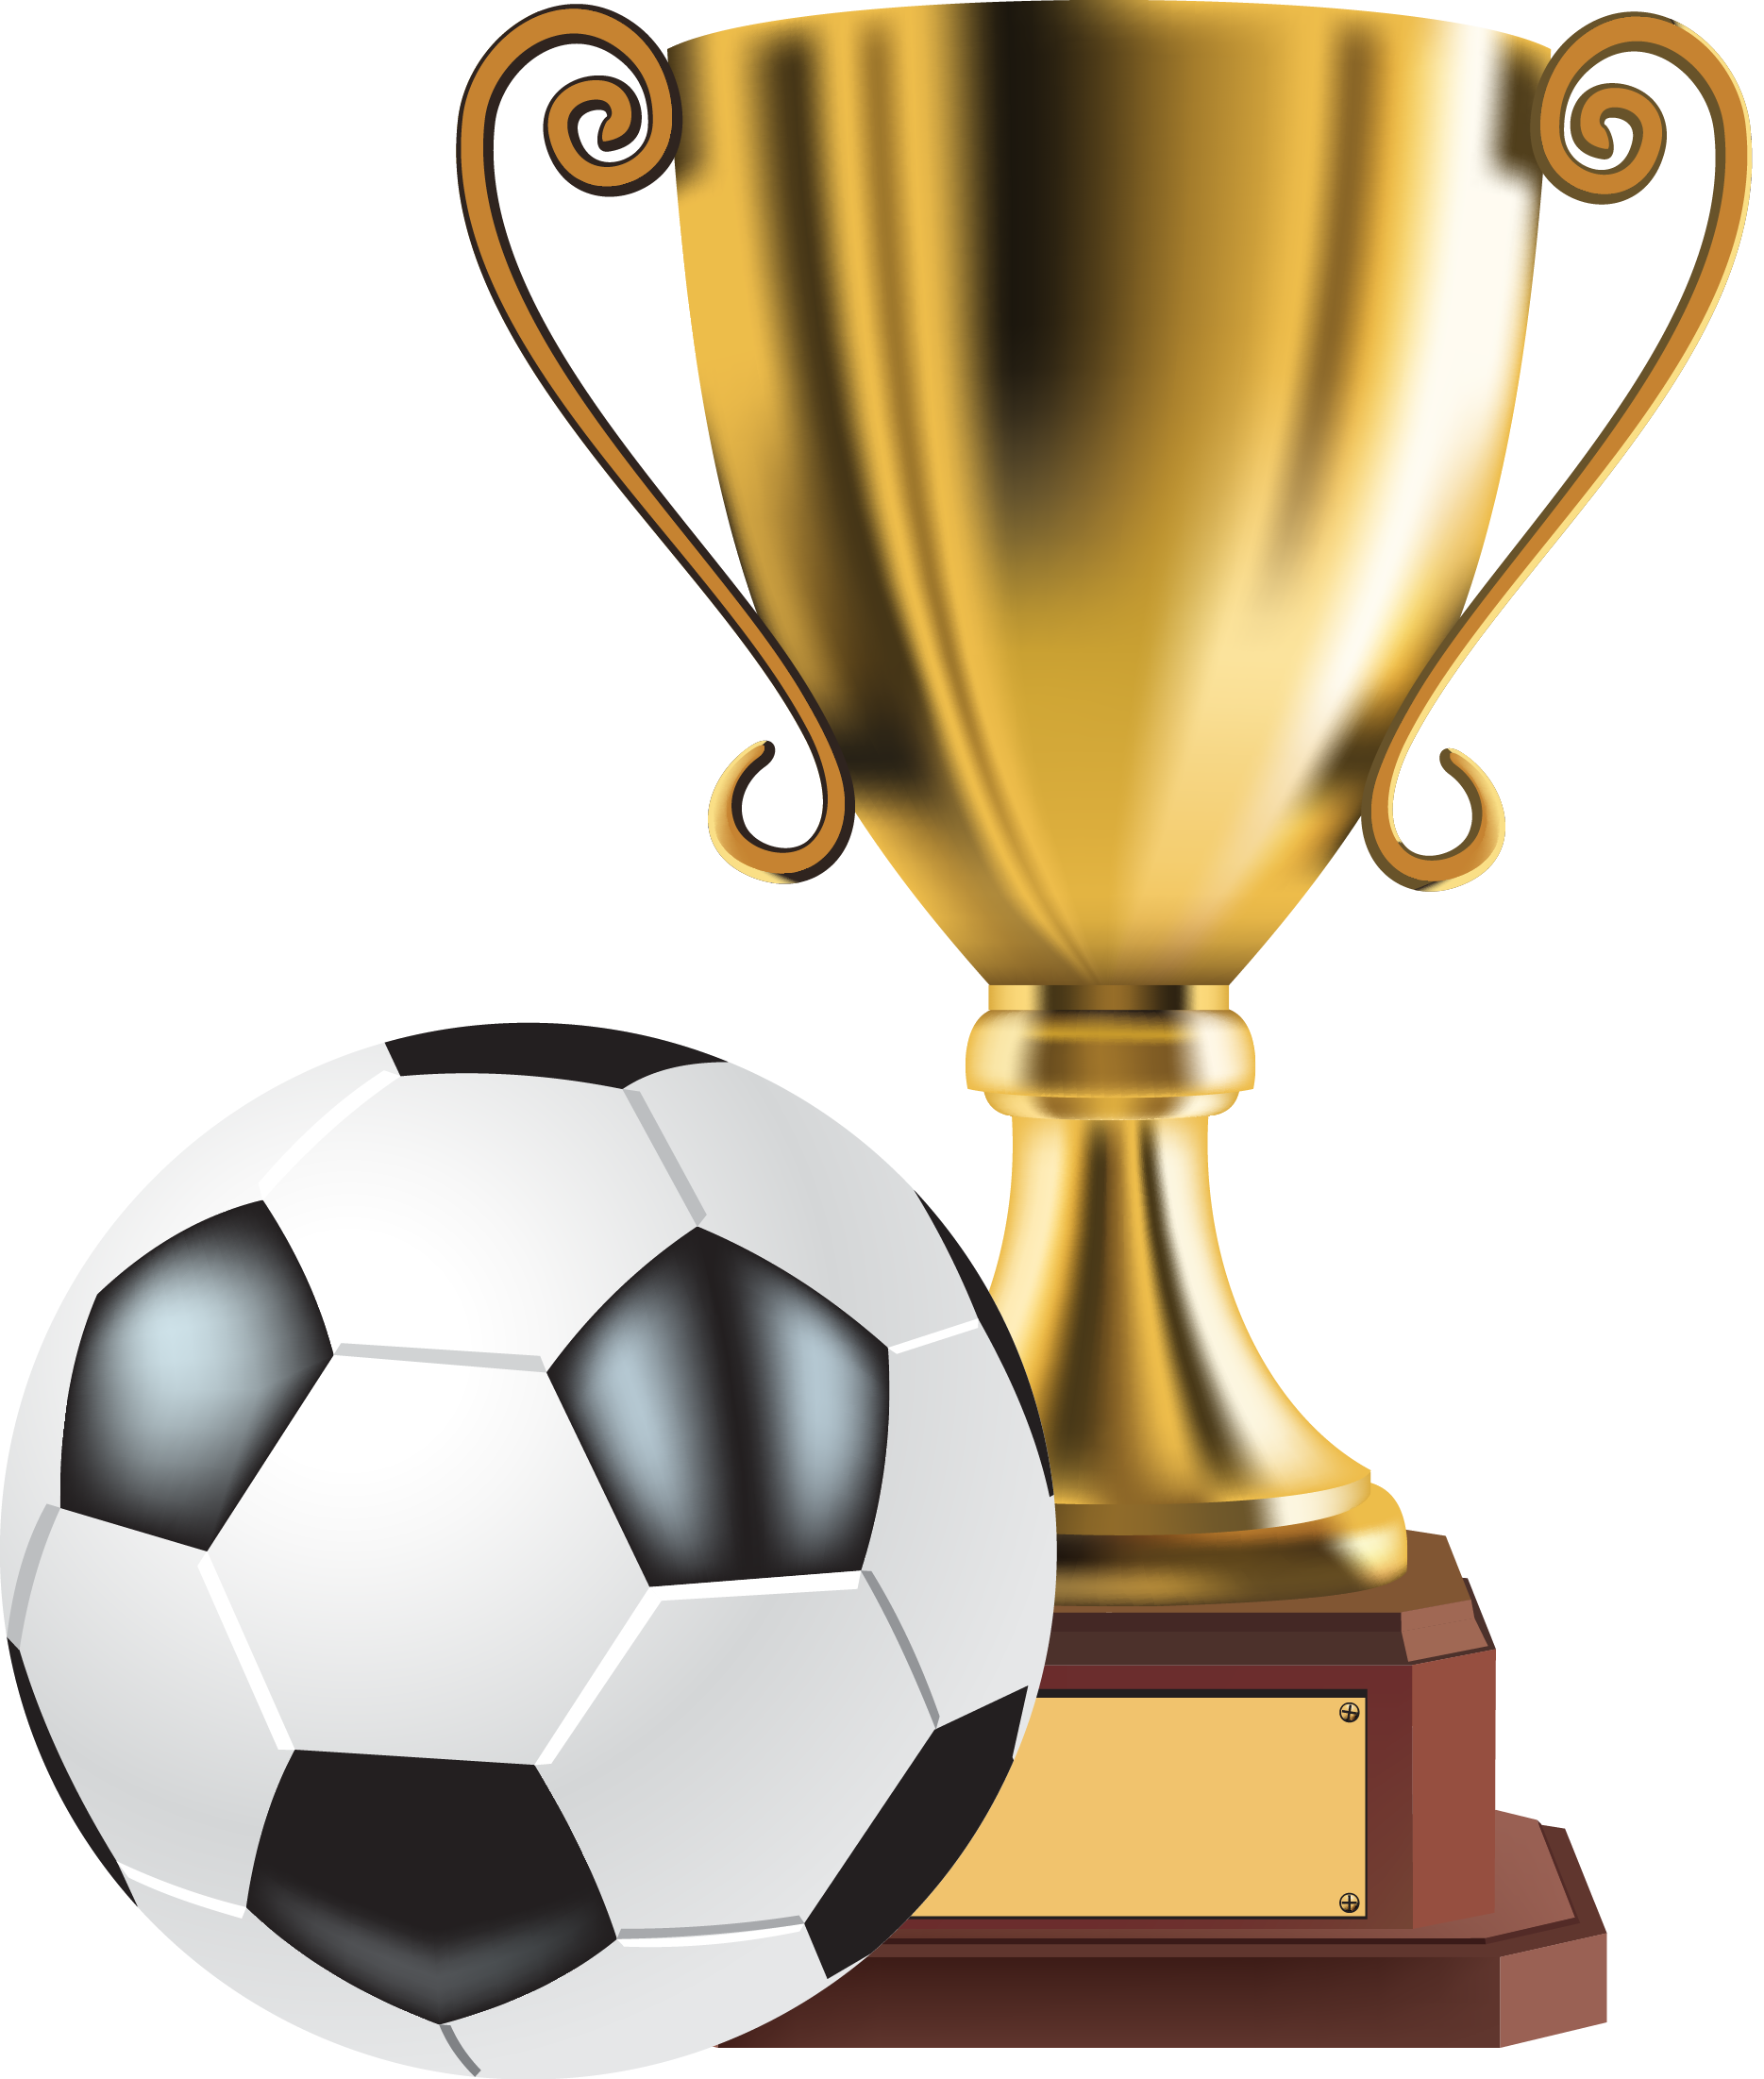 Football trophies clipart clip transparent download Trophy Gold medal Clip art - Soccer Trophy 1869*2203 transprent Png ... clip transparent download